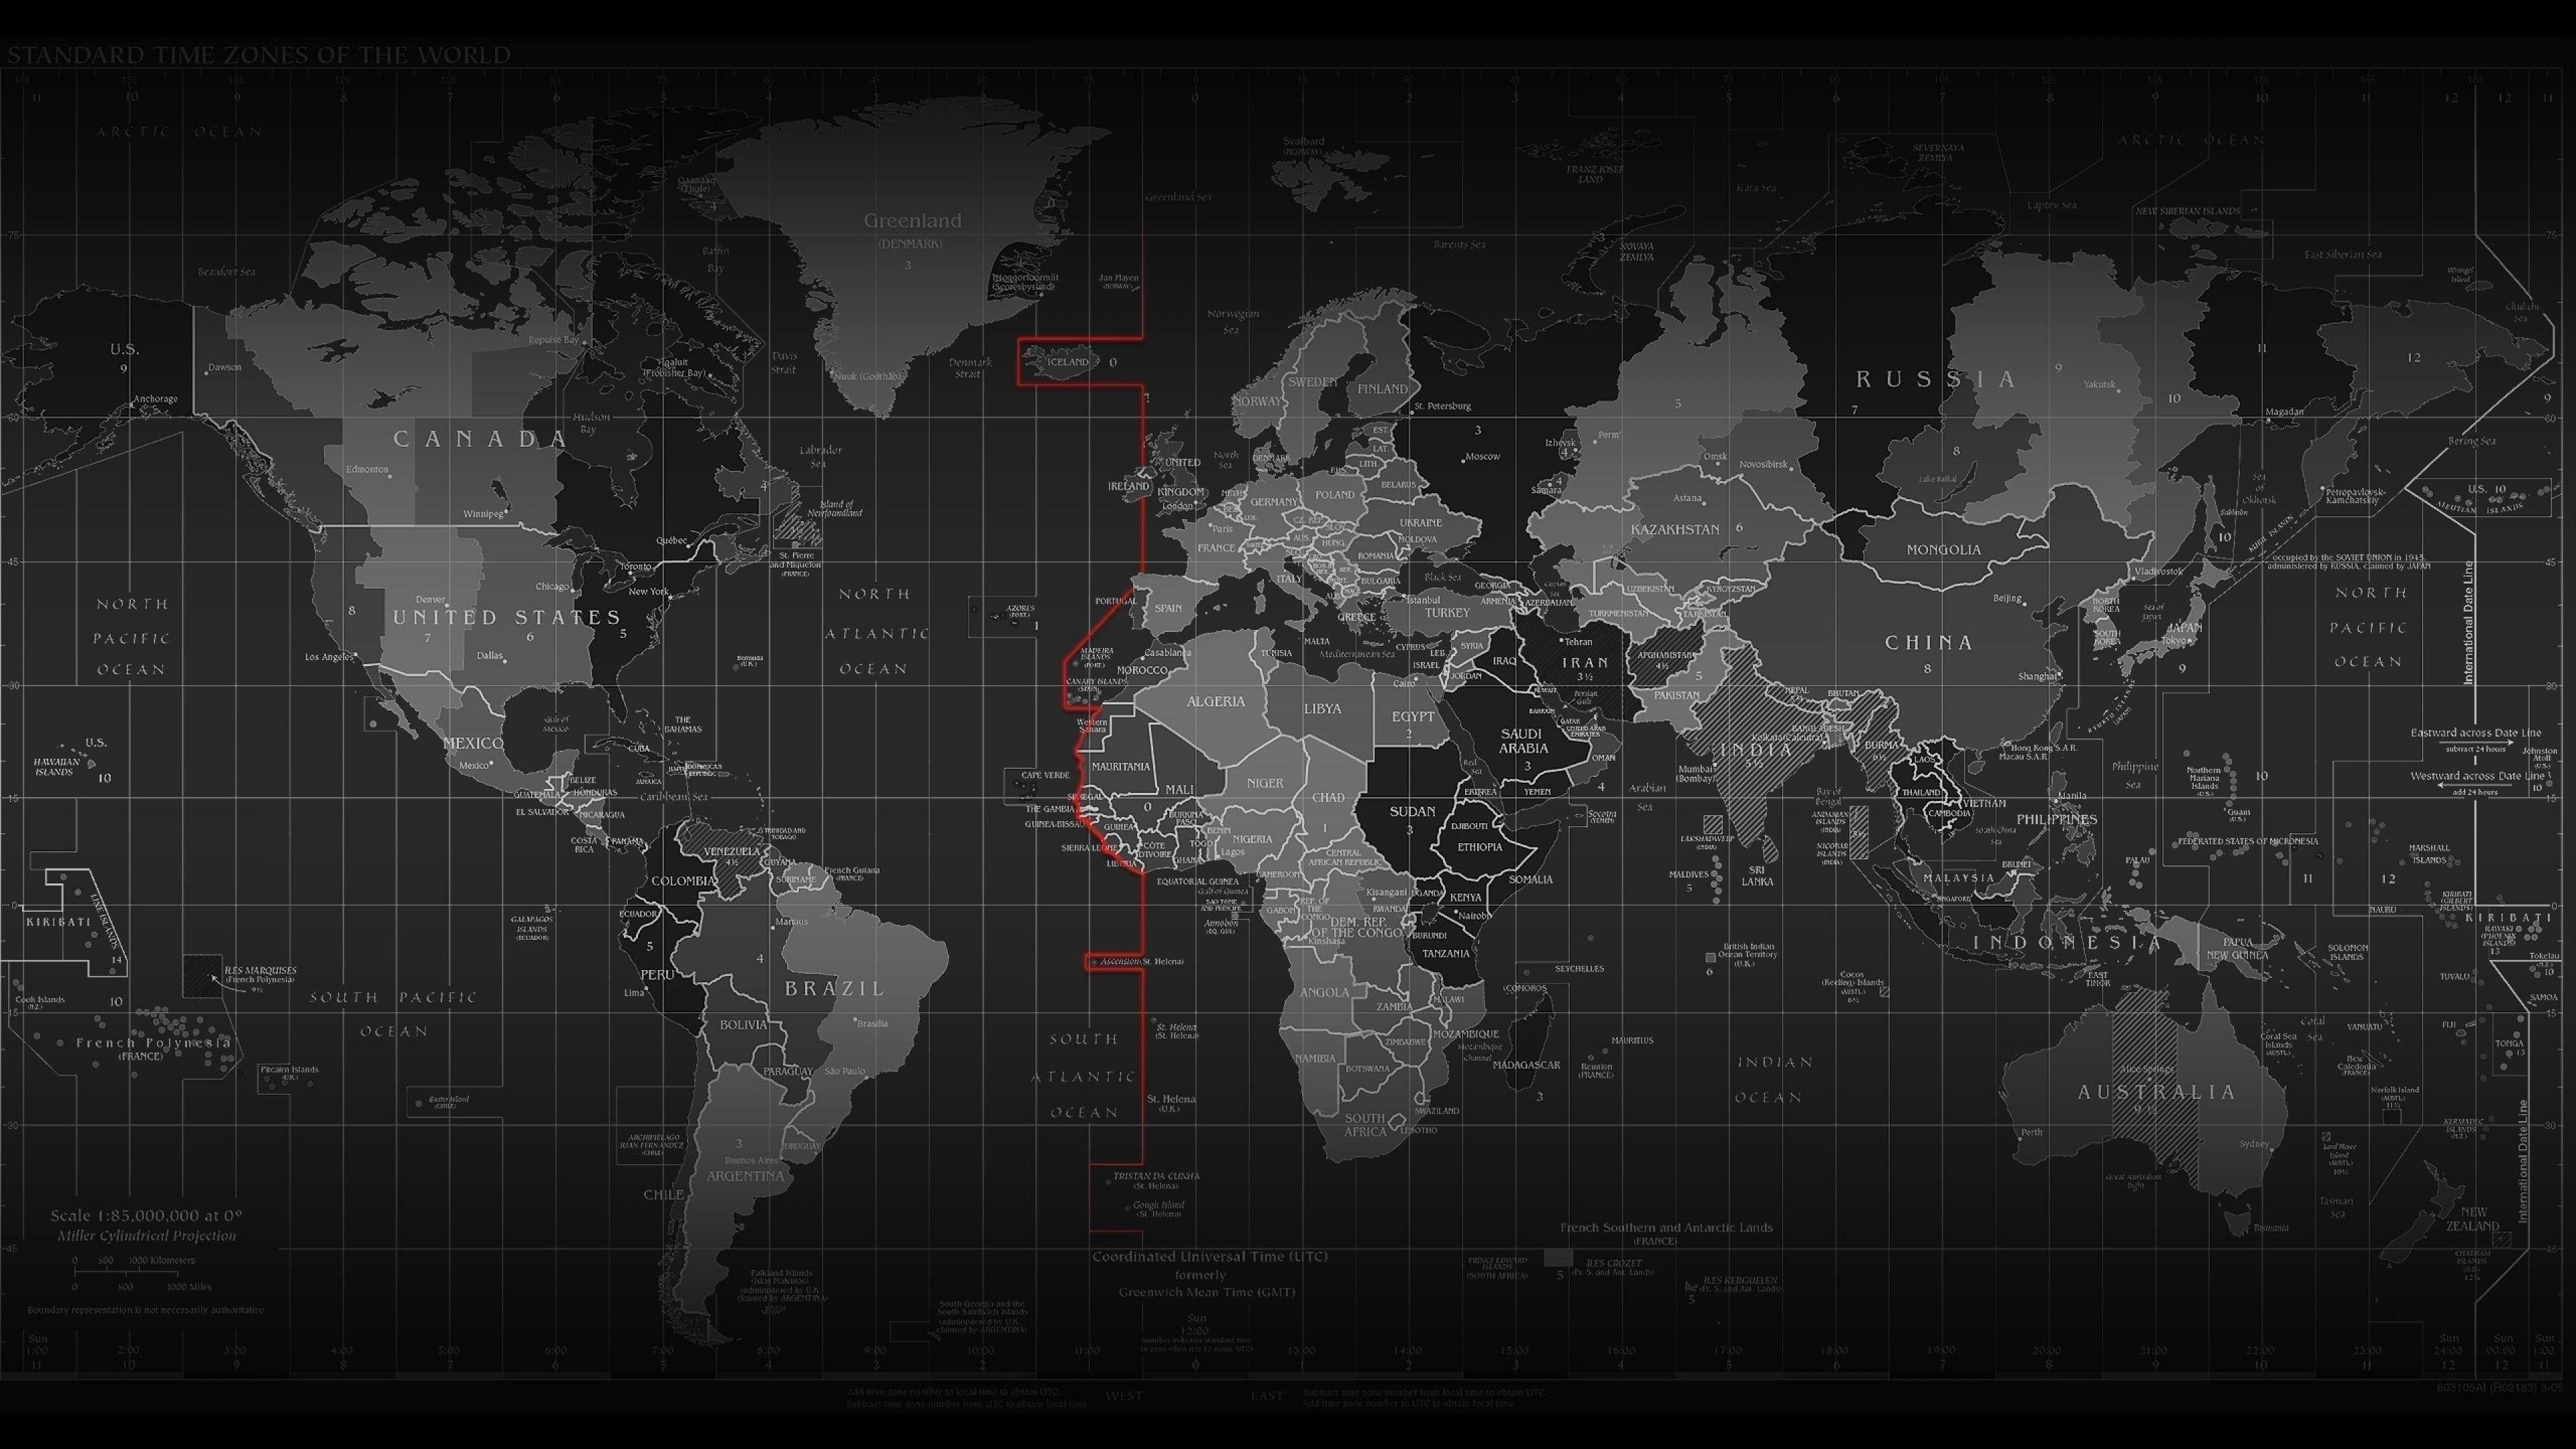 World Map Wallpaper For Windows Copy Black And White Map The World Wallpaper Valid World Map Mura Ea Bc Dunya Haritalari Dovus Sanatlari Harita